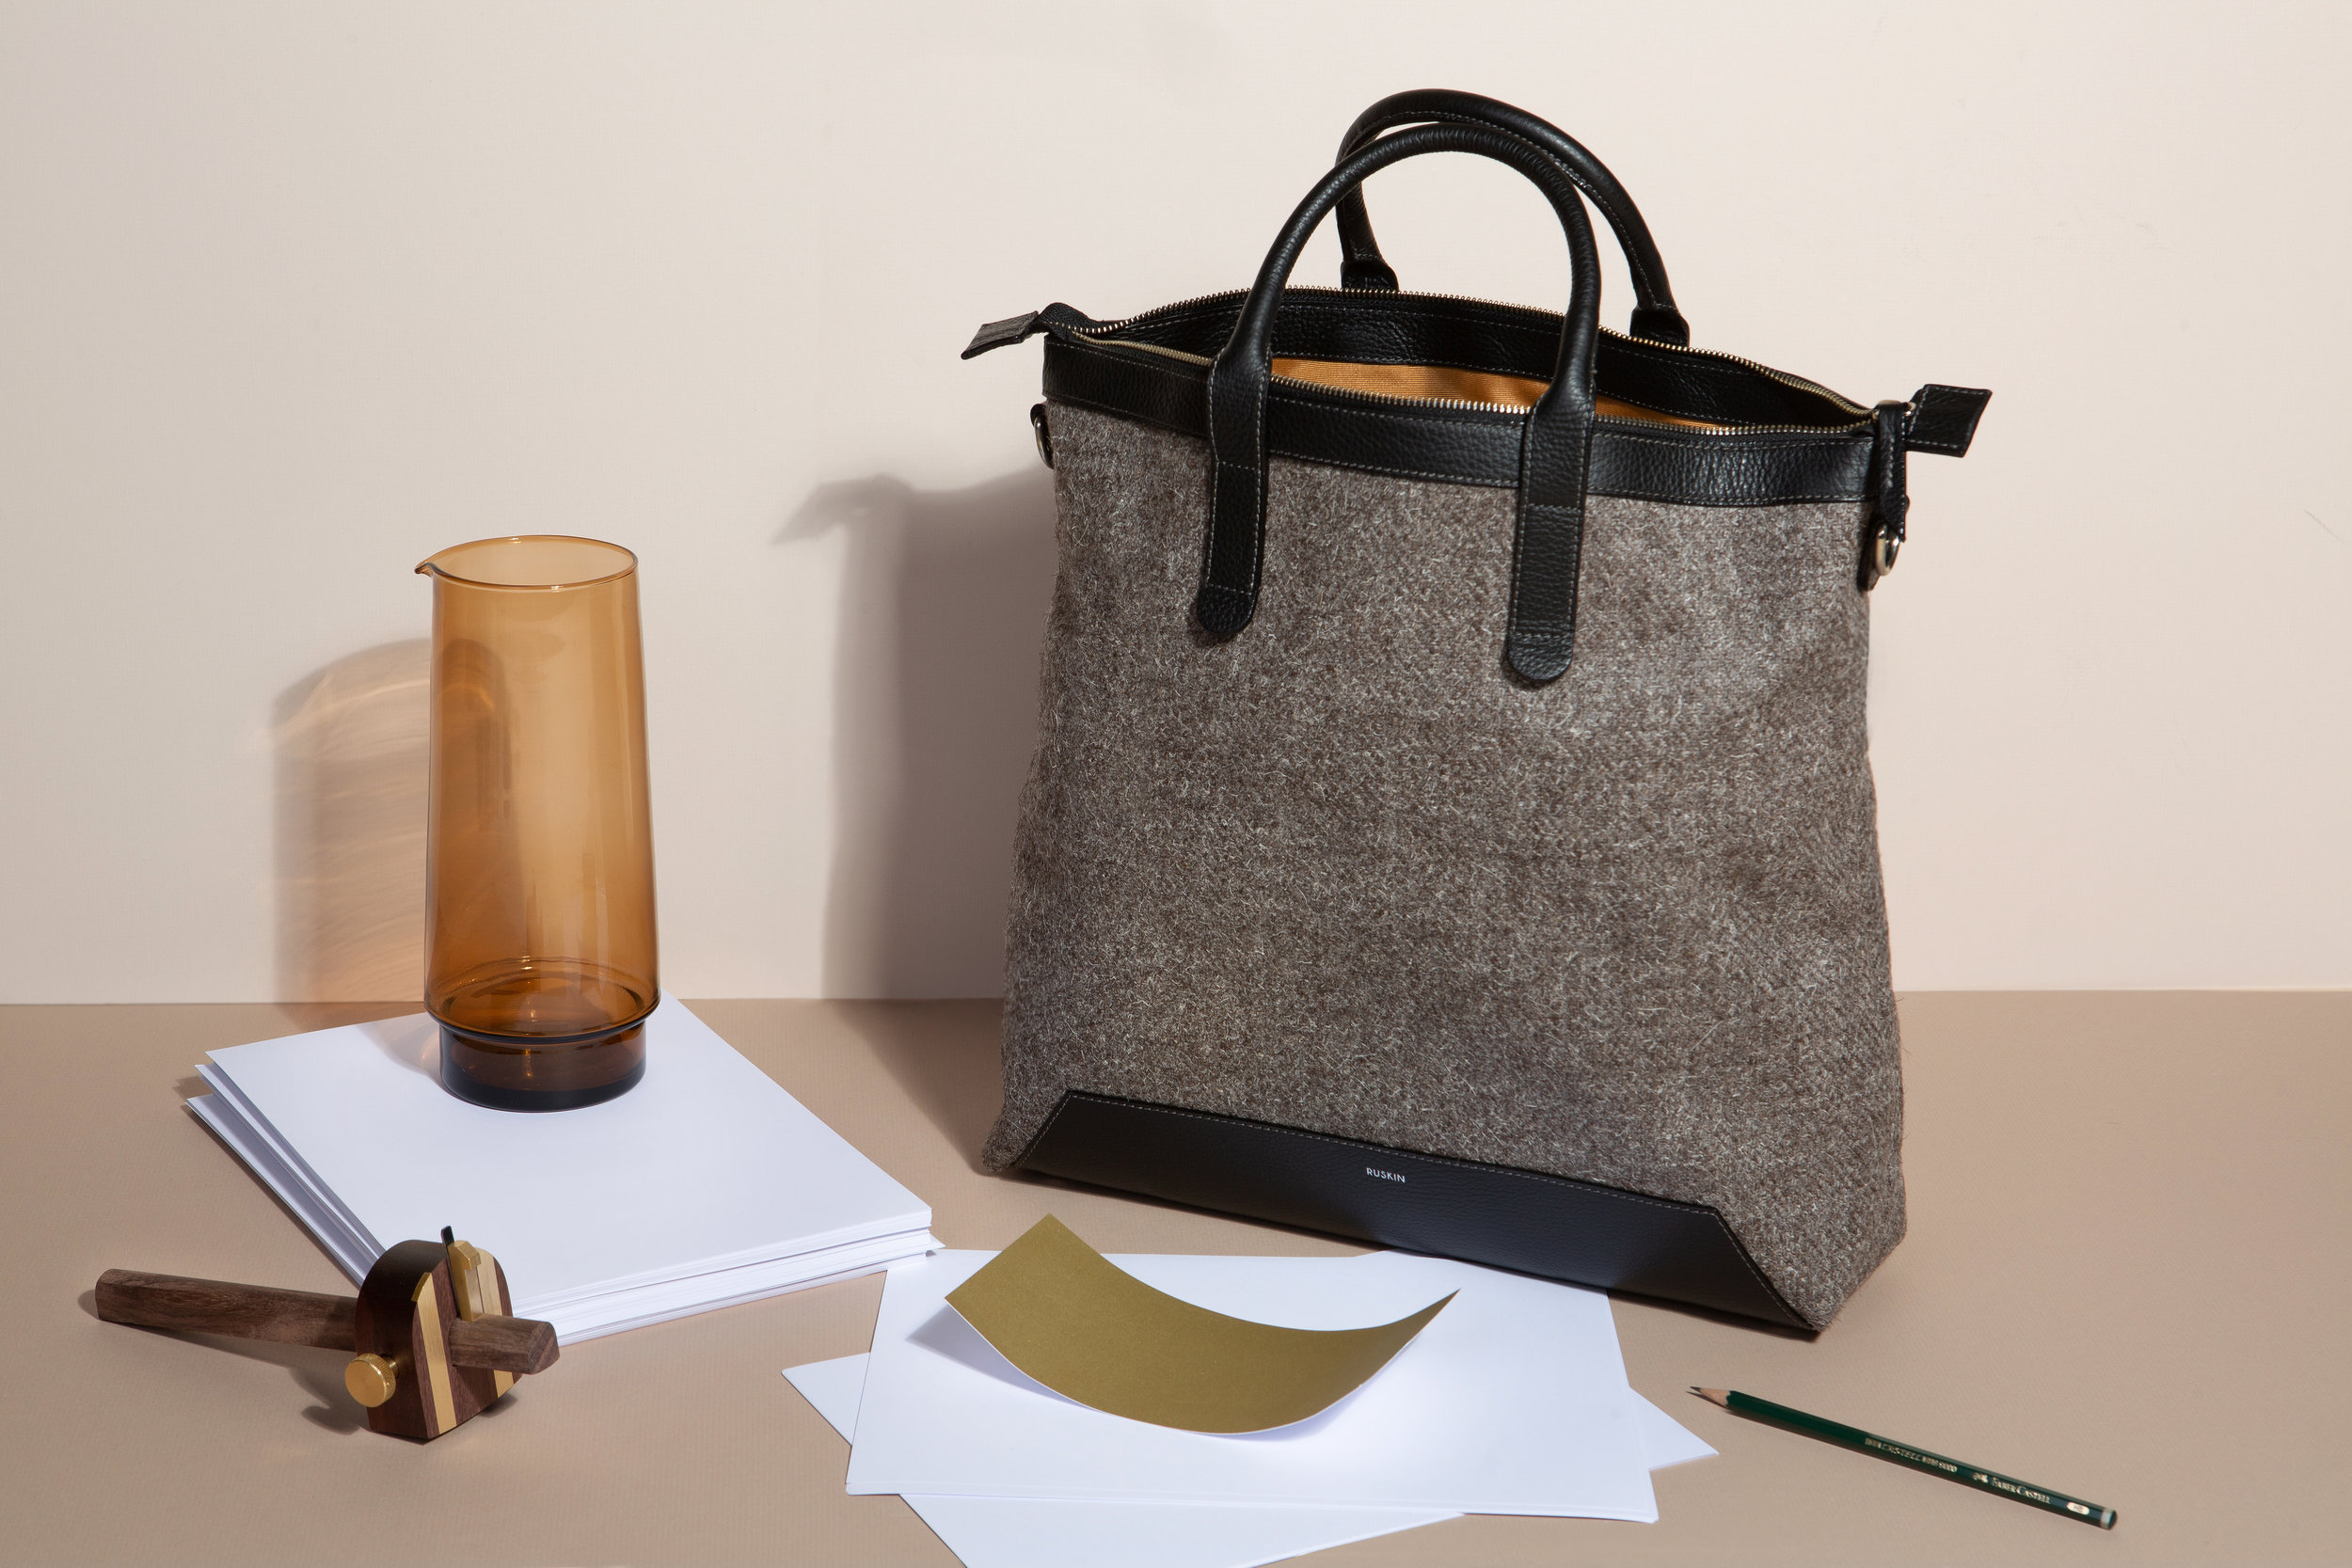 Ruskin-bags-082_CC_Web.jpg